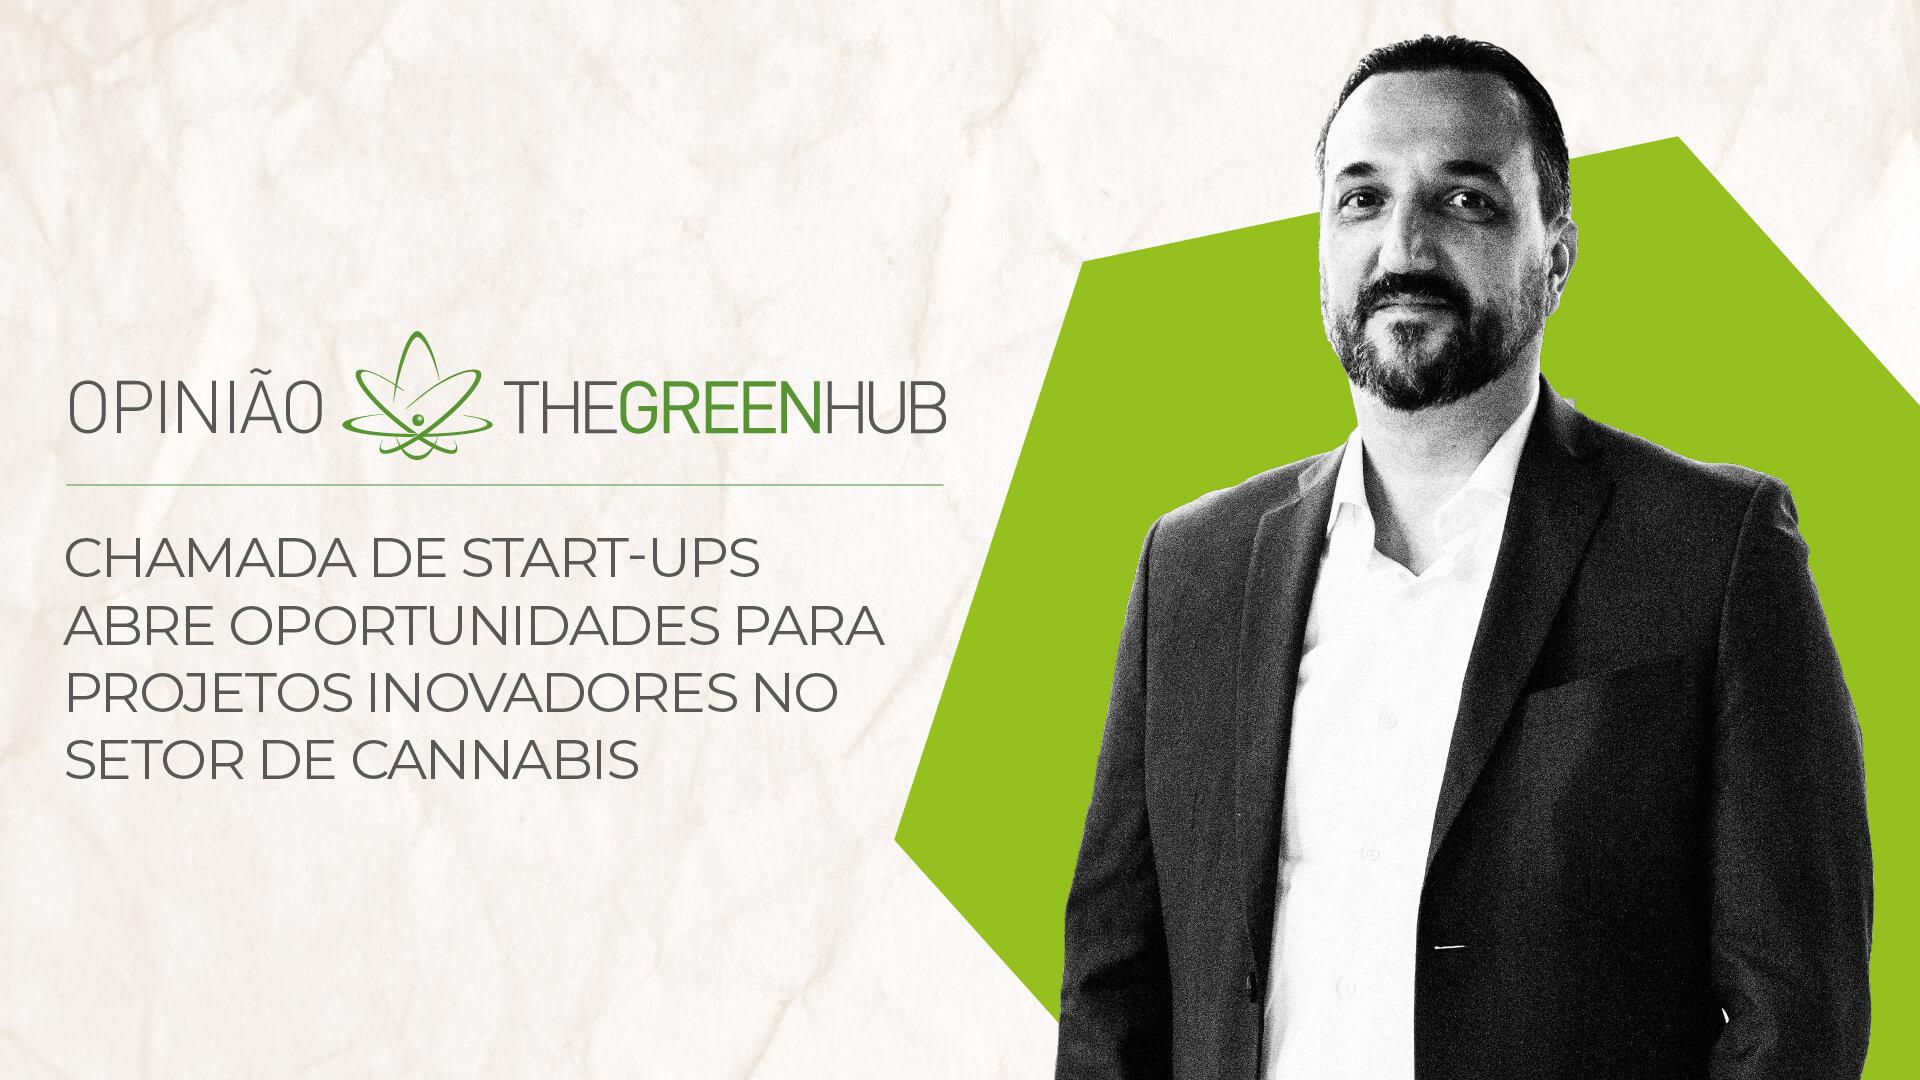 Chamada de start-ups abre oportunidades para projetos inovadores no setor de cannabis